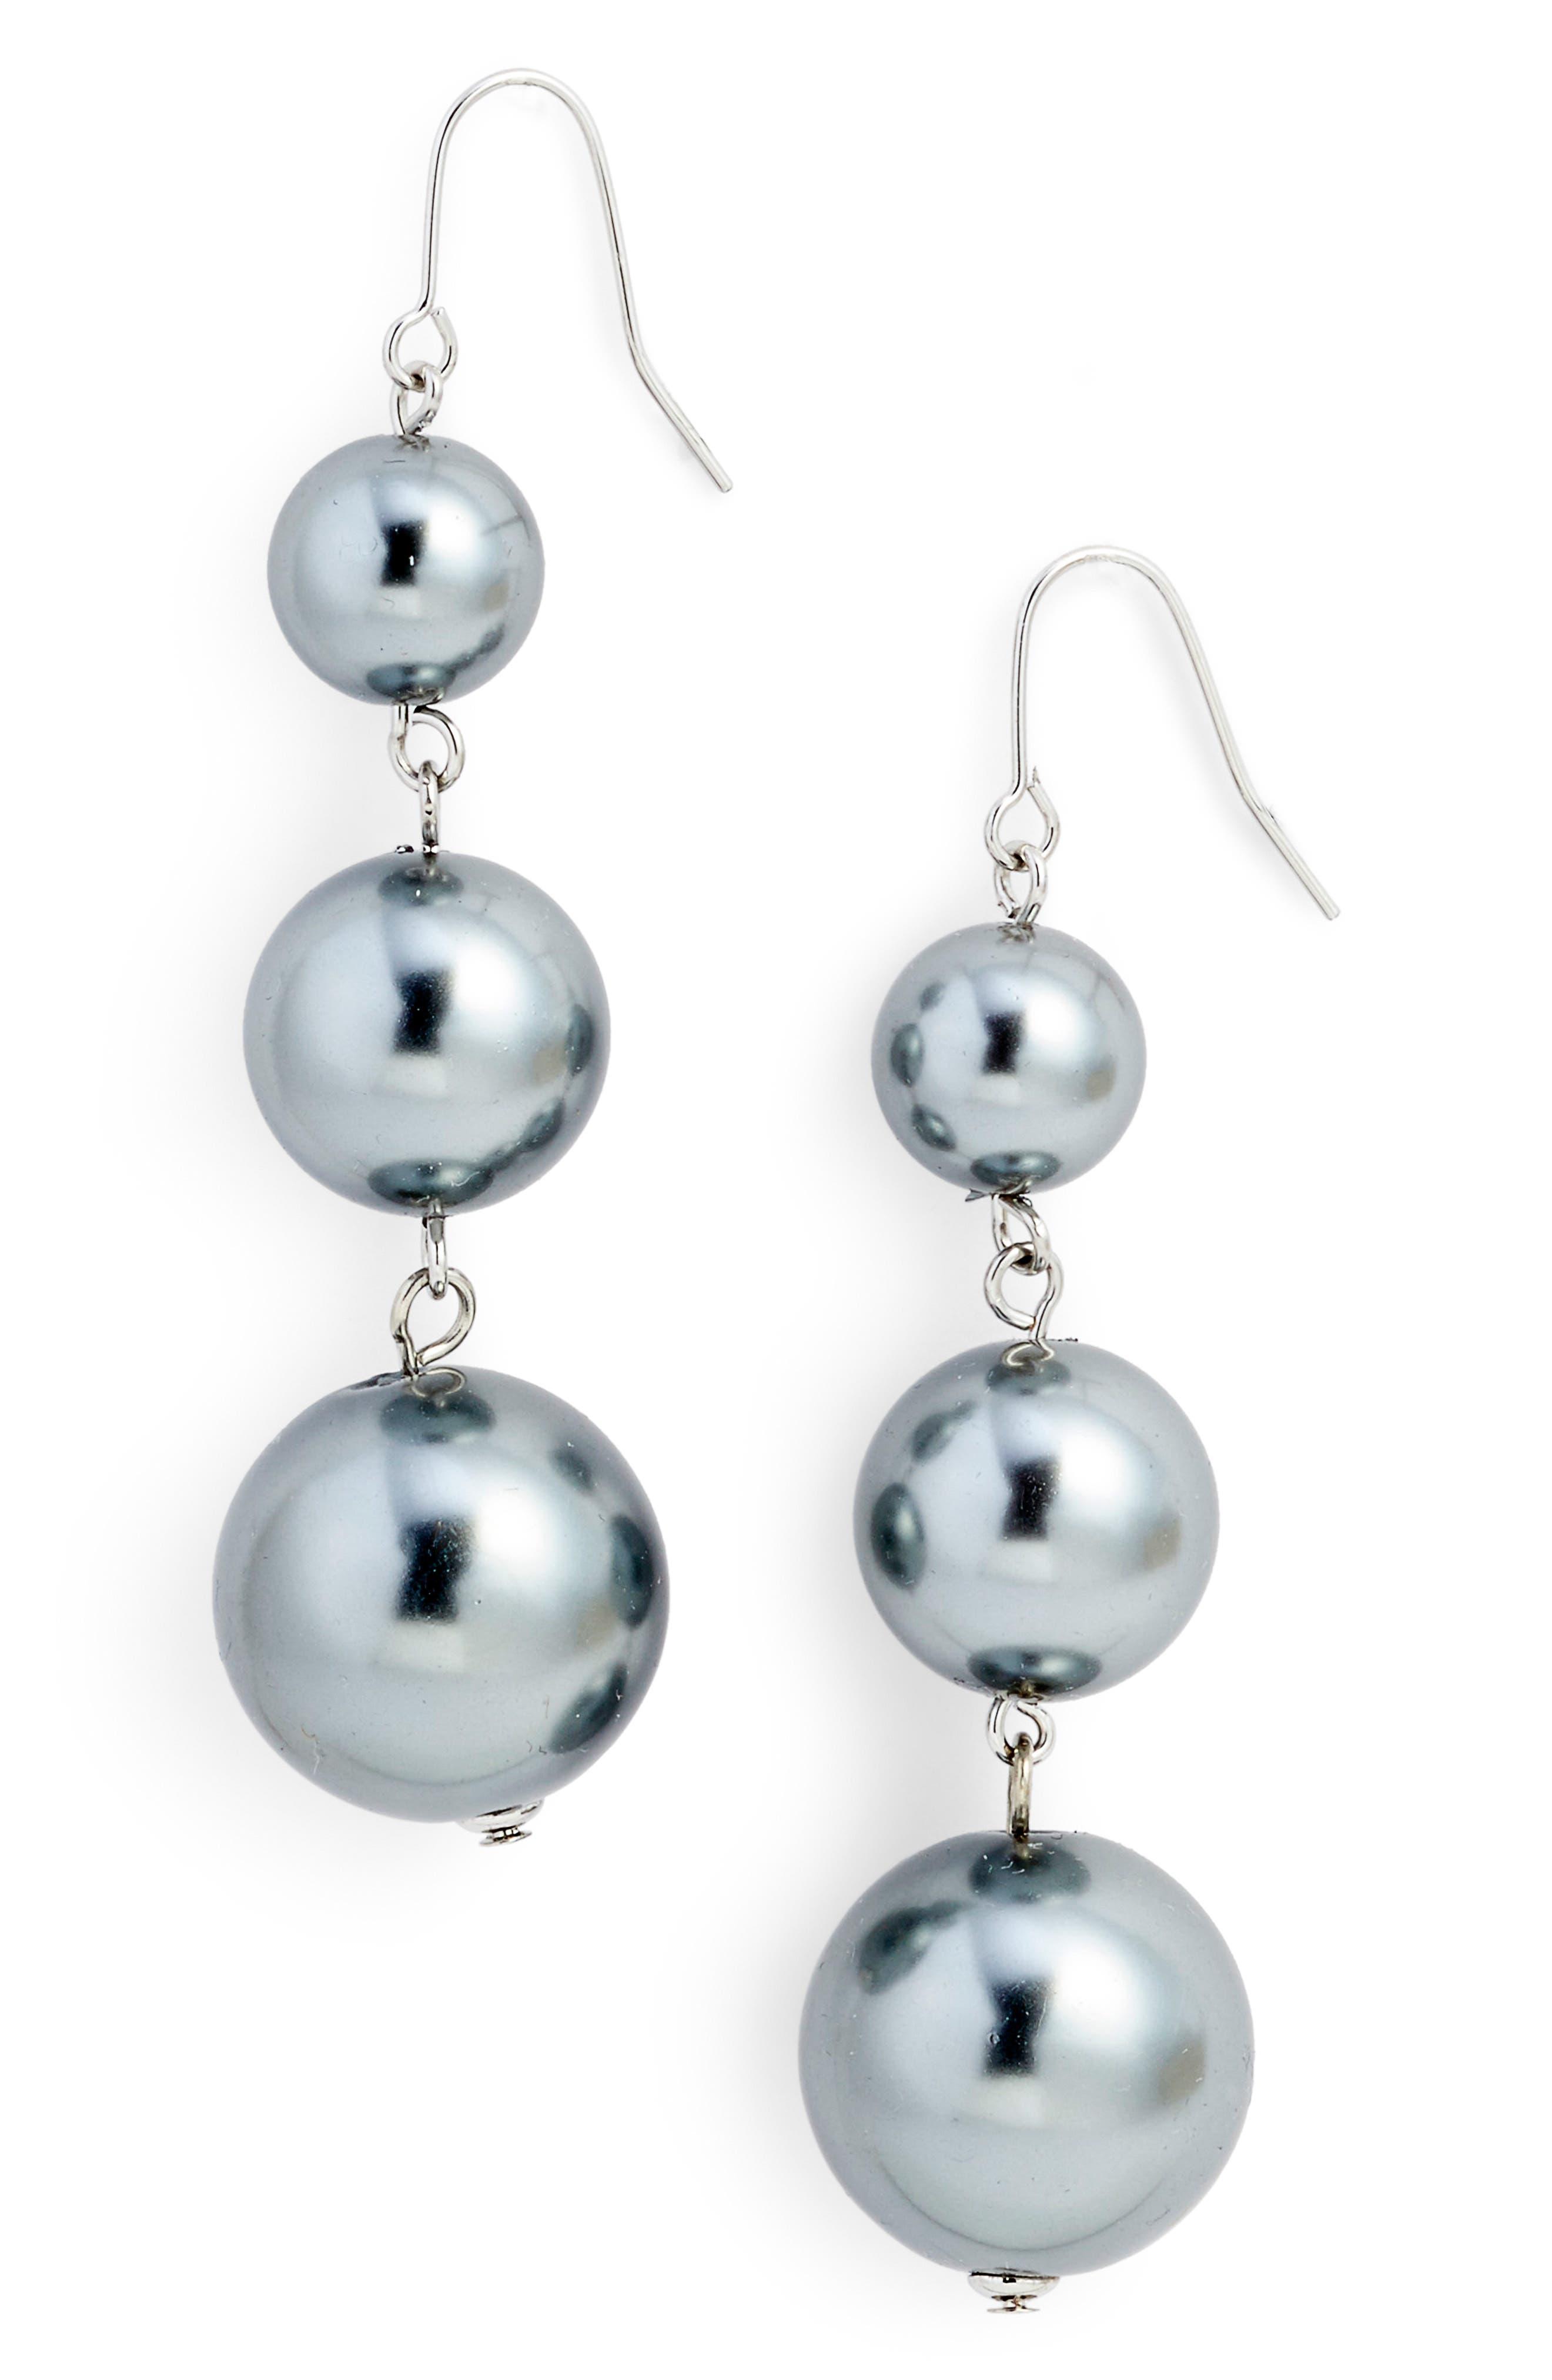 Imitation Pearl Drop Earrings,                             Main thumbnail 1, color,                             041